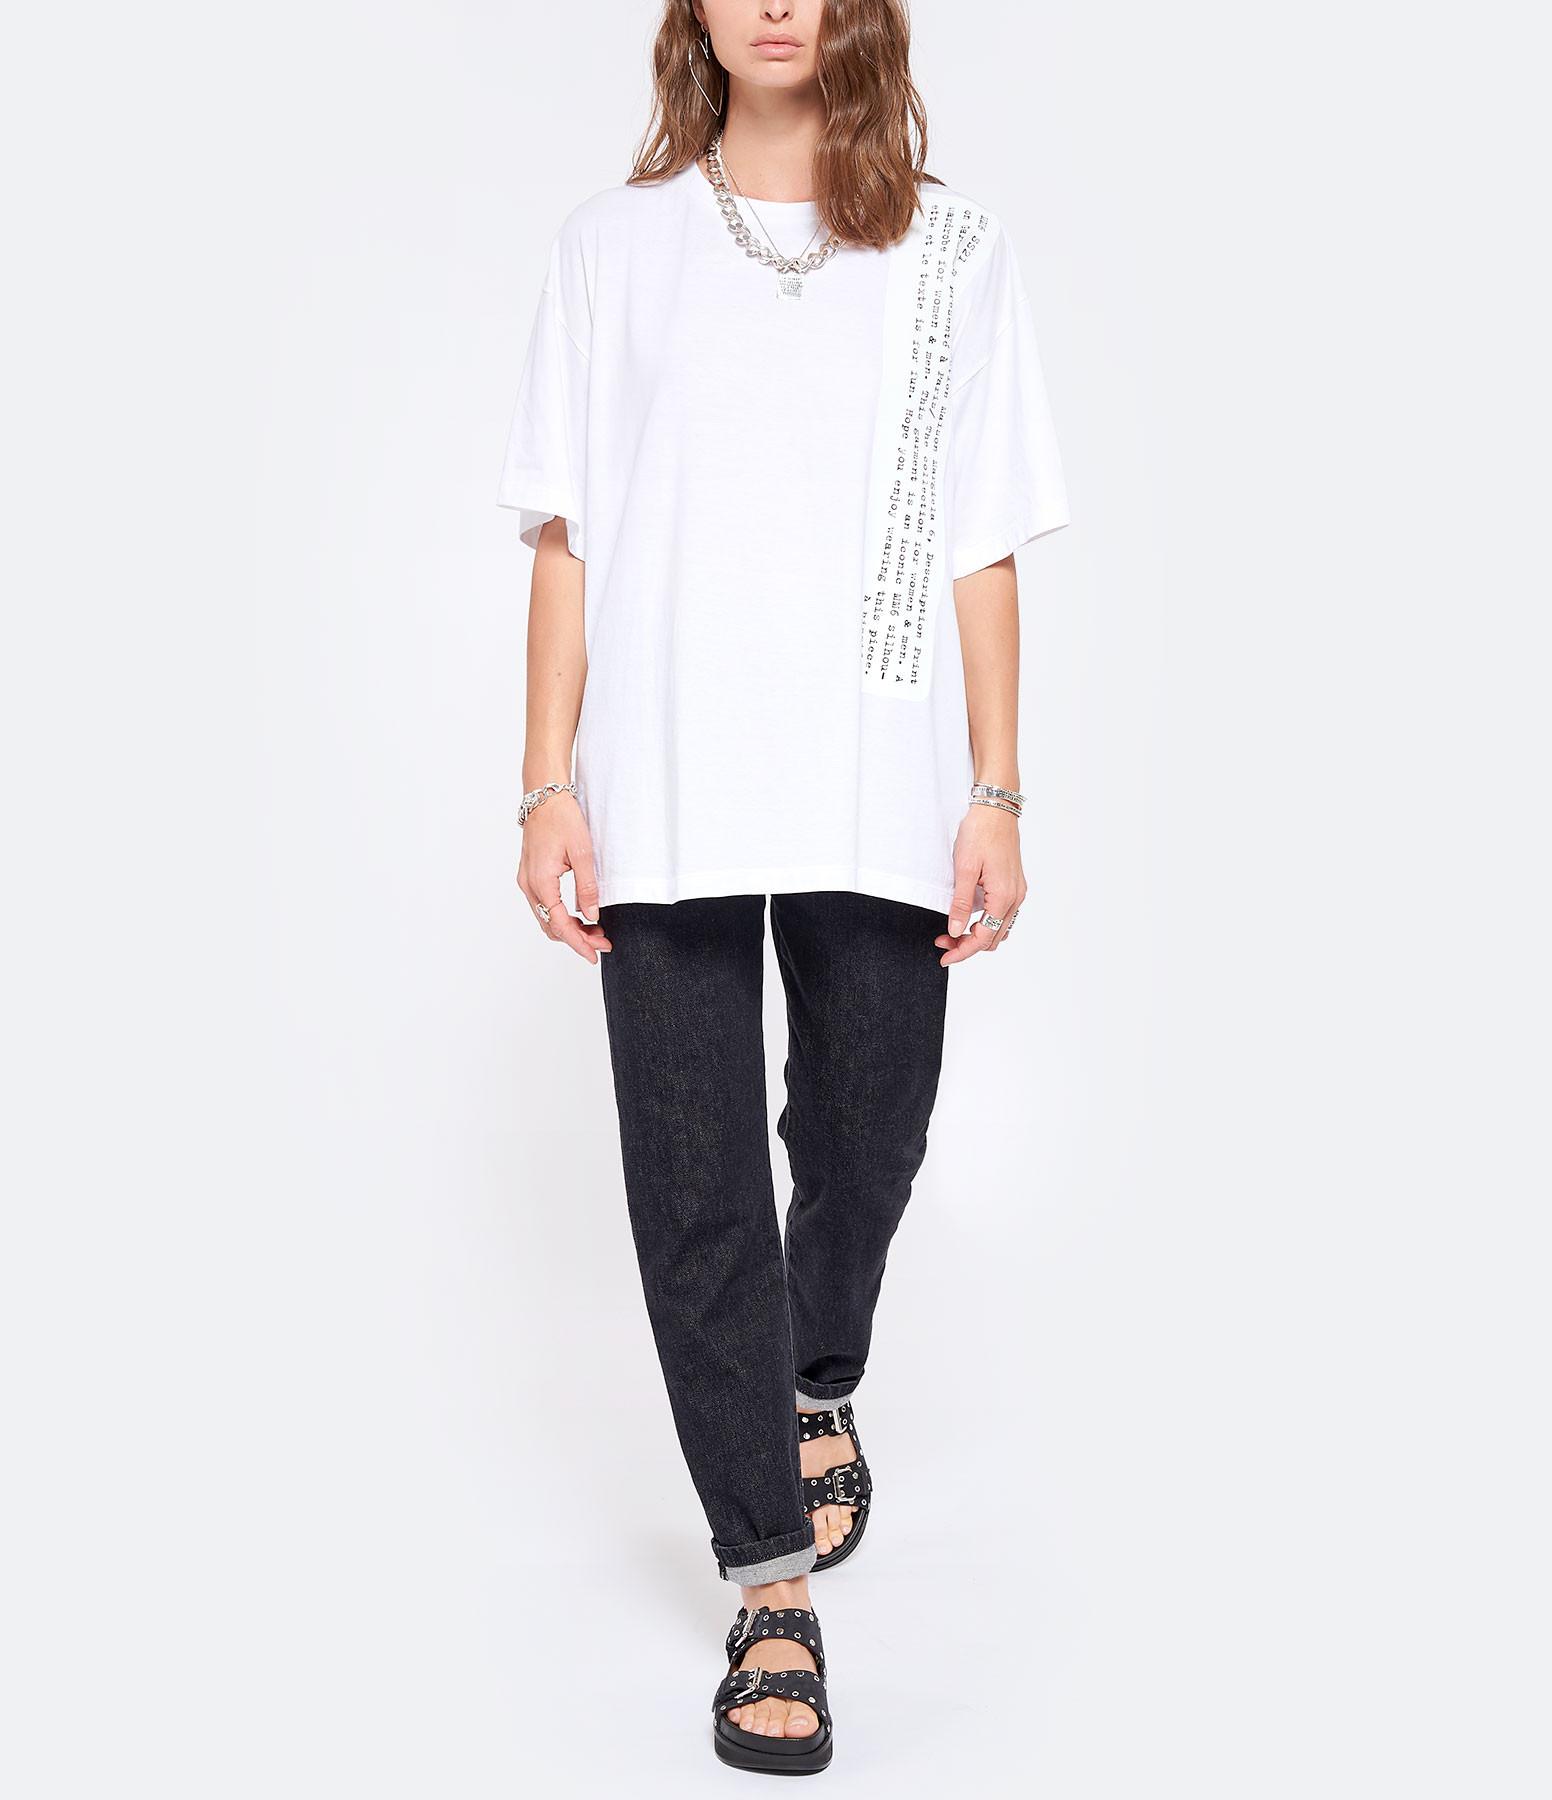 MM6 MAISON MARGIELA - Tee-shirt Coton Blanc, Collection Studio